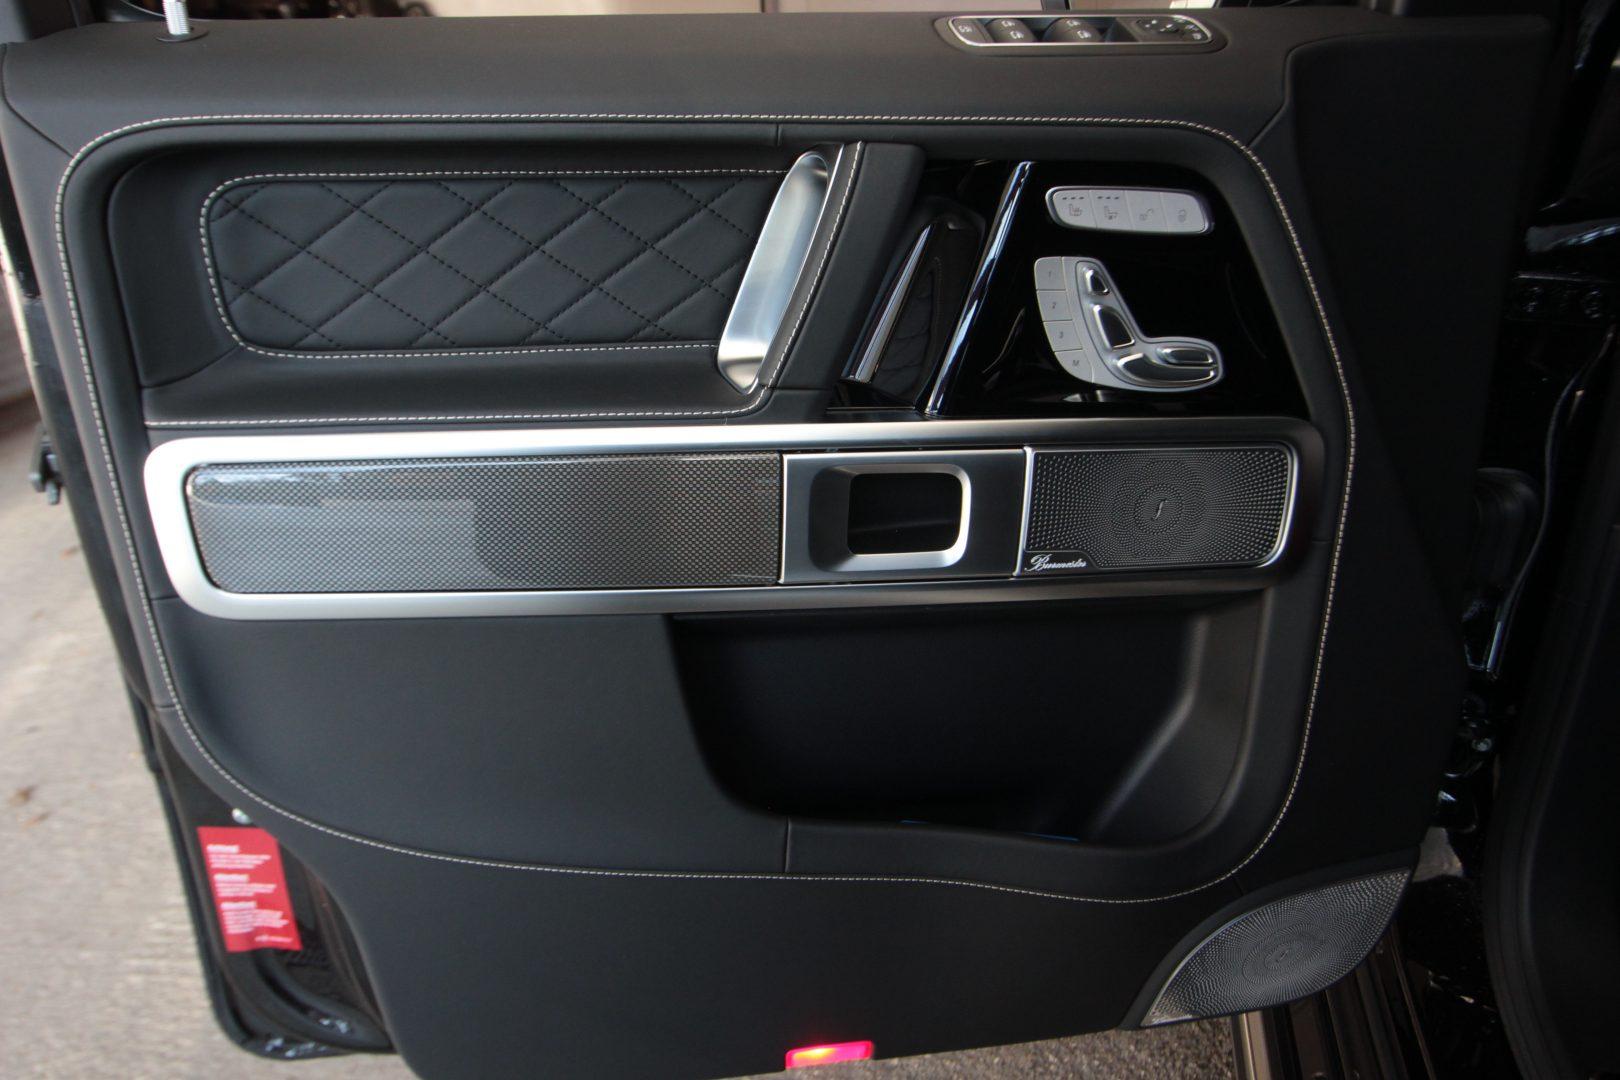 AIL Mercedes-Benz G 400 d Stronger than time Edition 4